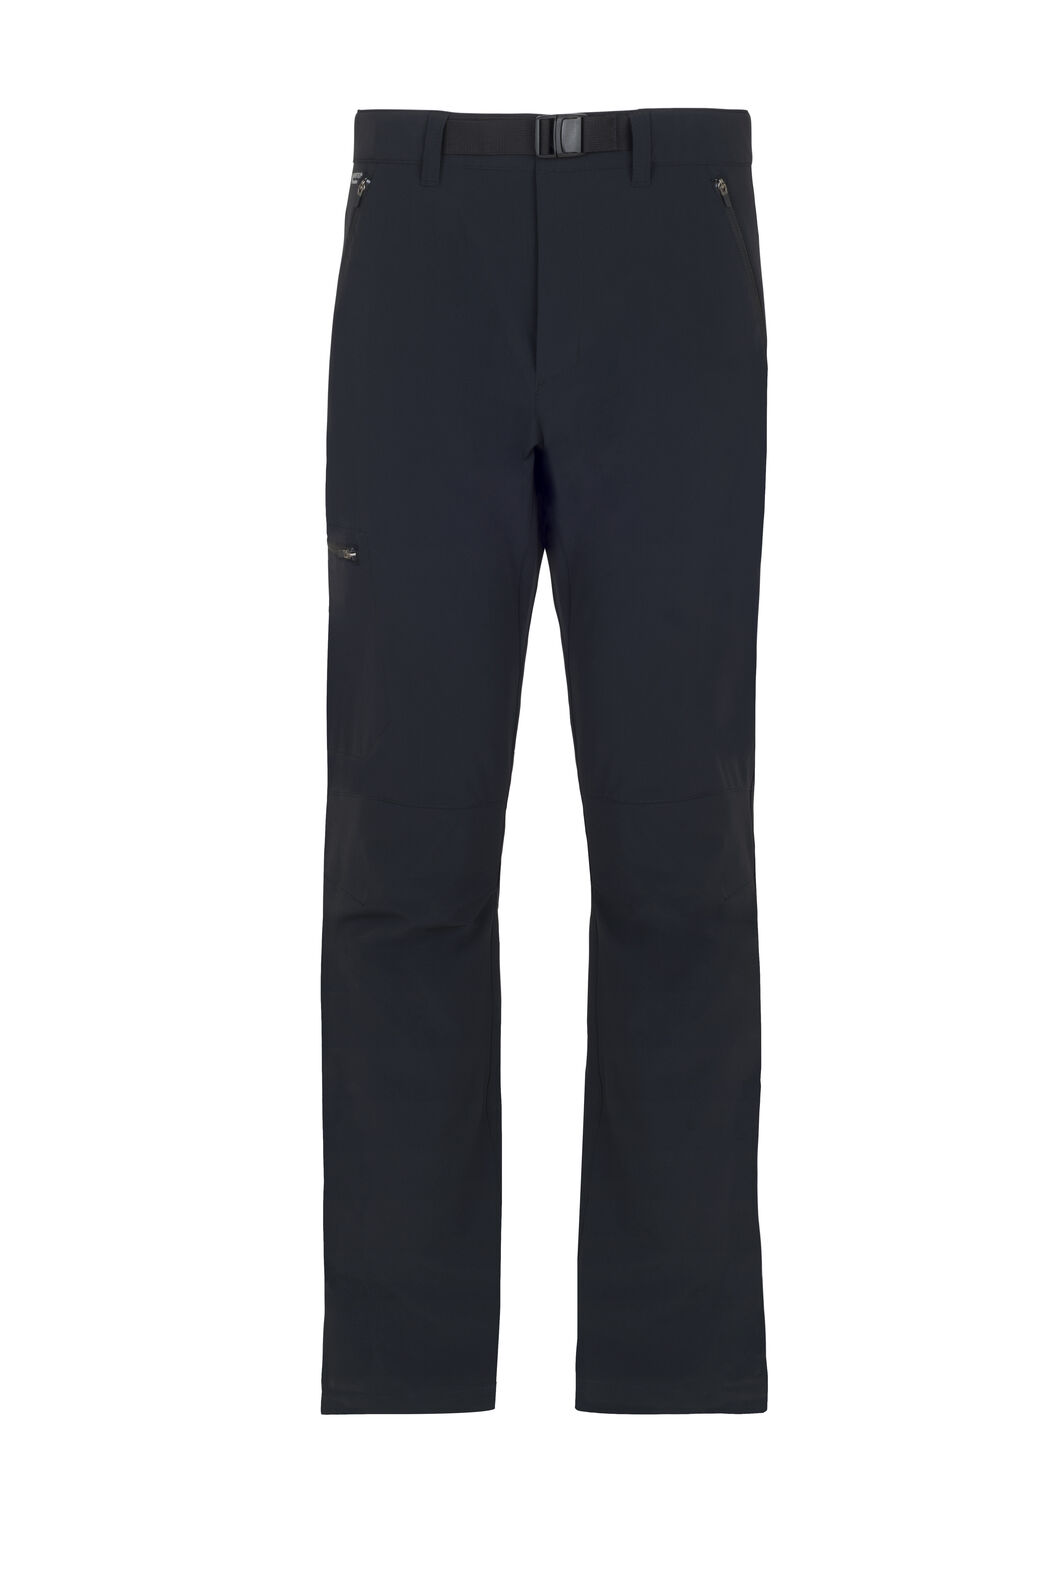 Macpac Trekker Lite Pertex® Equilibrium Softshell Pants - Men's, Black, hi-res